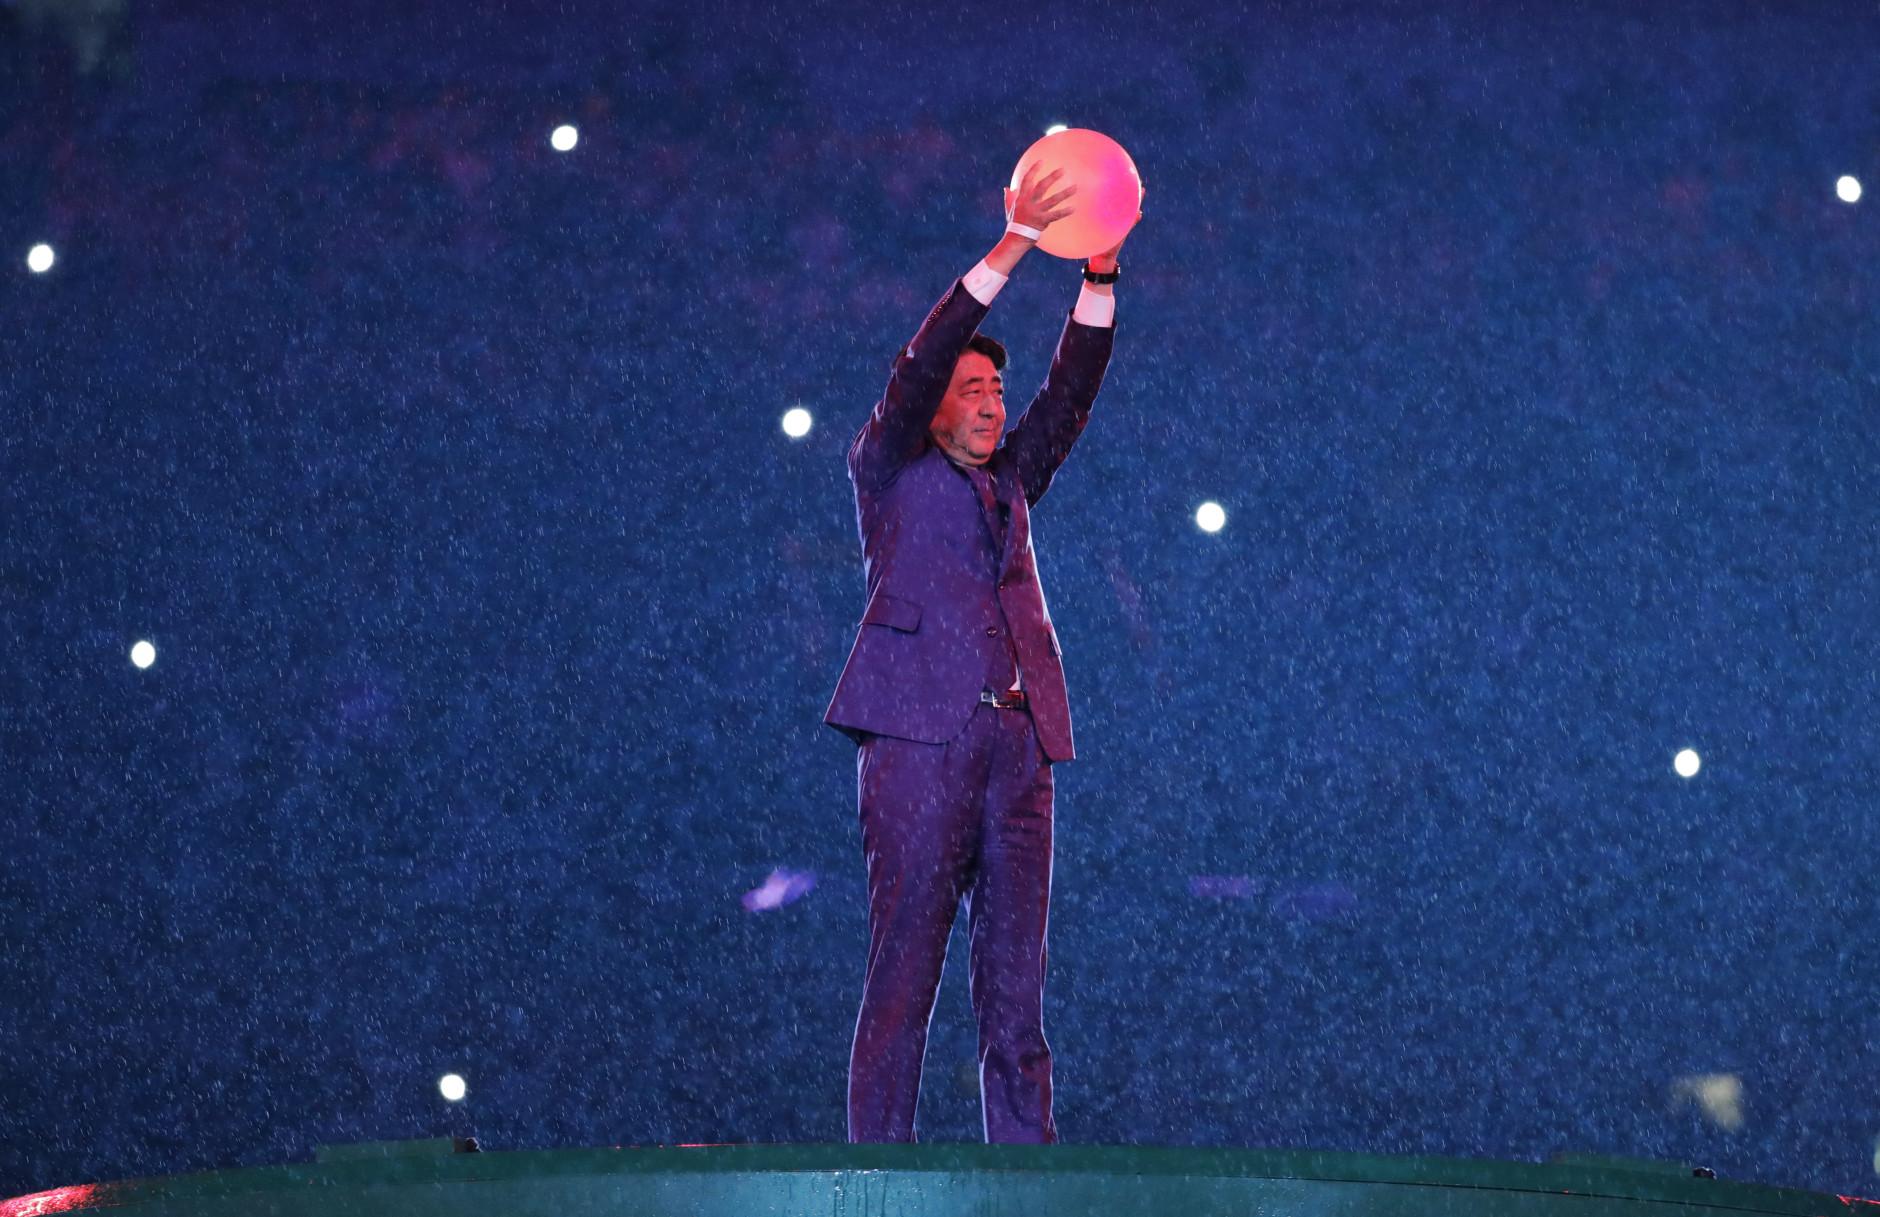 Japanese Prime Minister Shinzo Abe appears during the closing ceremony in the Maracana stadium at the 2016 Summer Olympics in Rio de Janeiro, Brazil, Sunday, Aug. 21, 2016. (AP Photo/Matt Dunham)